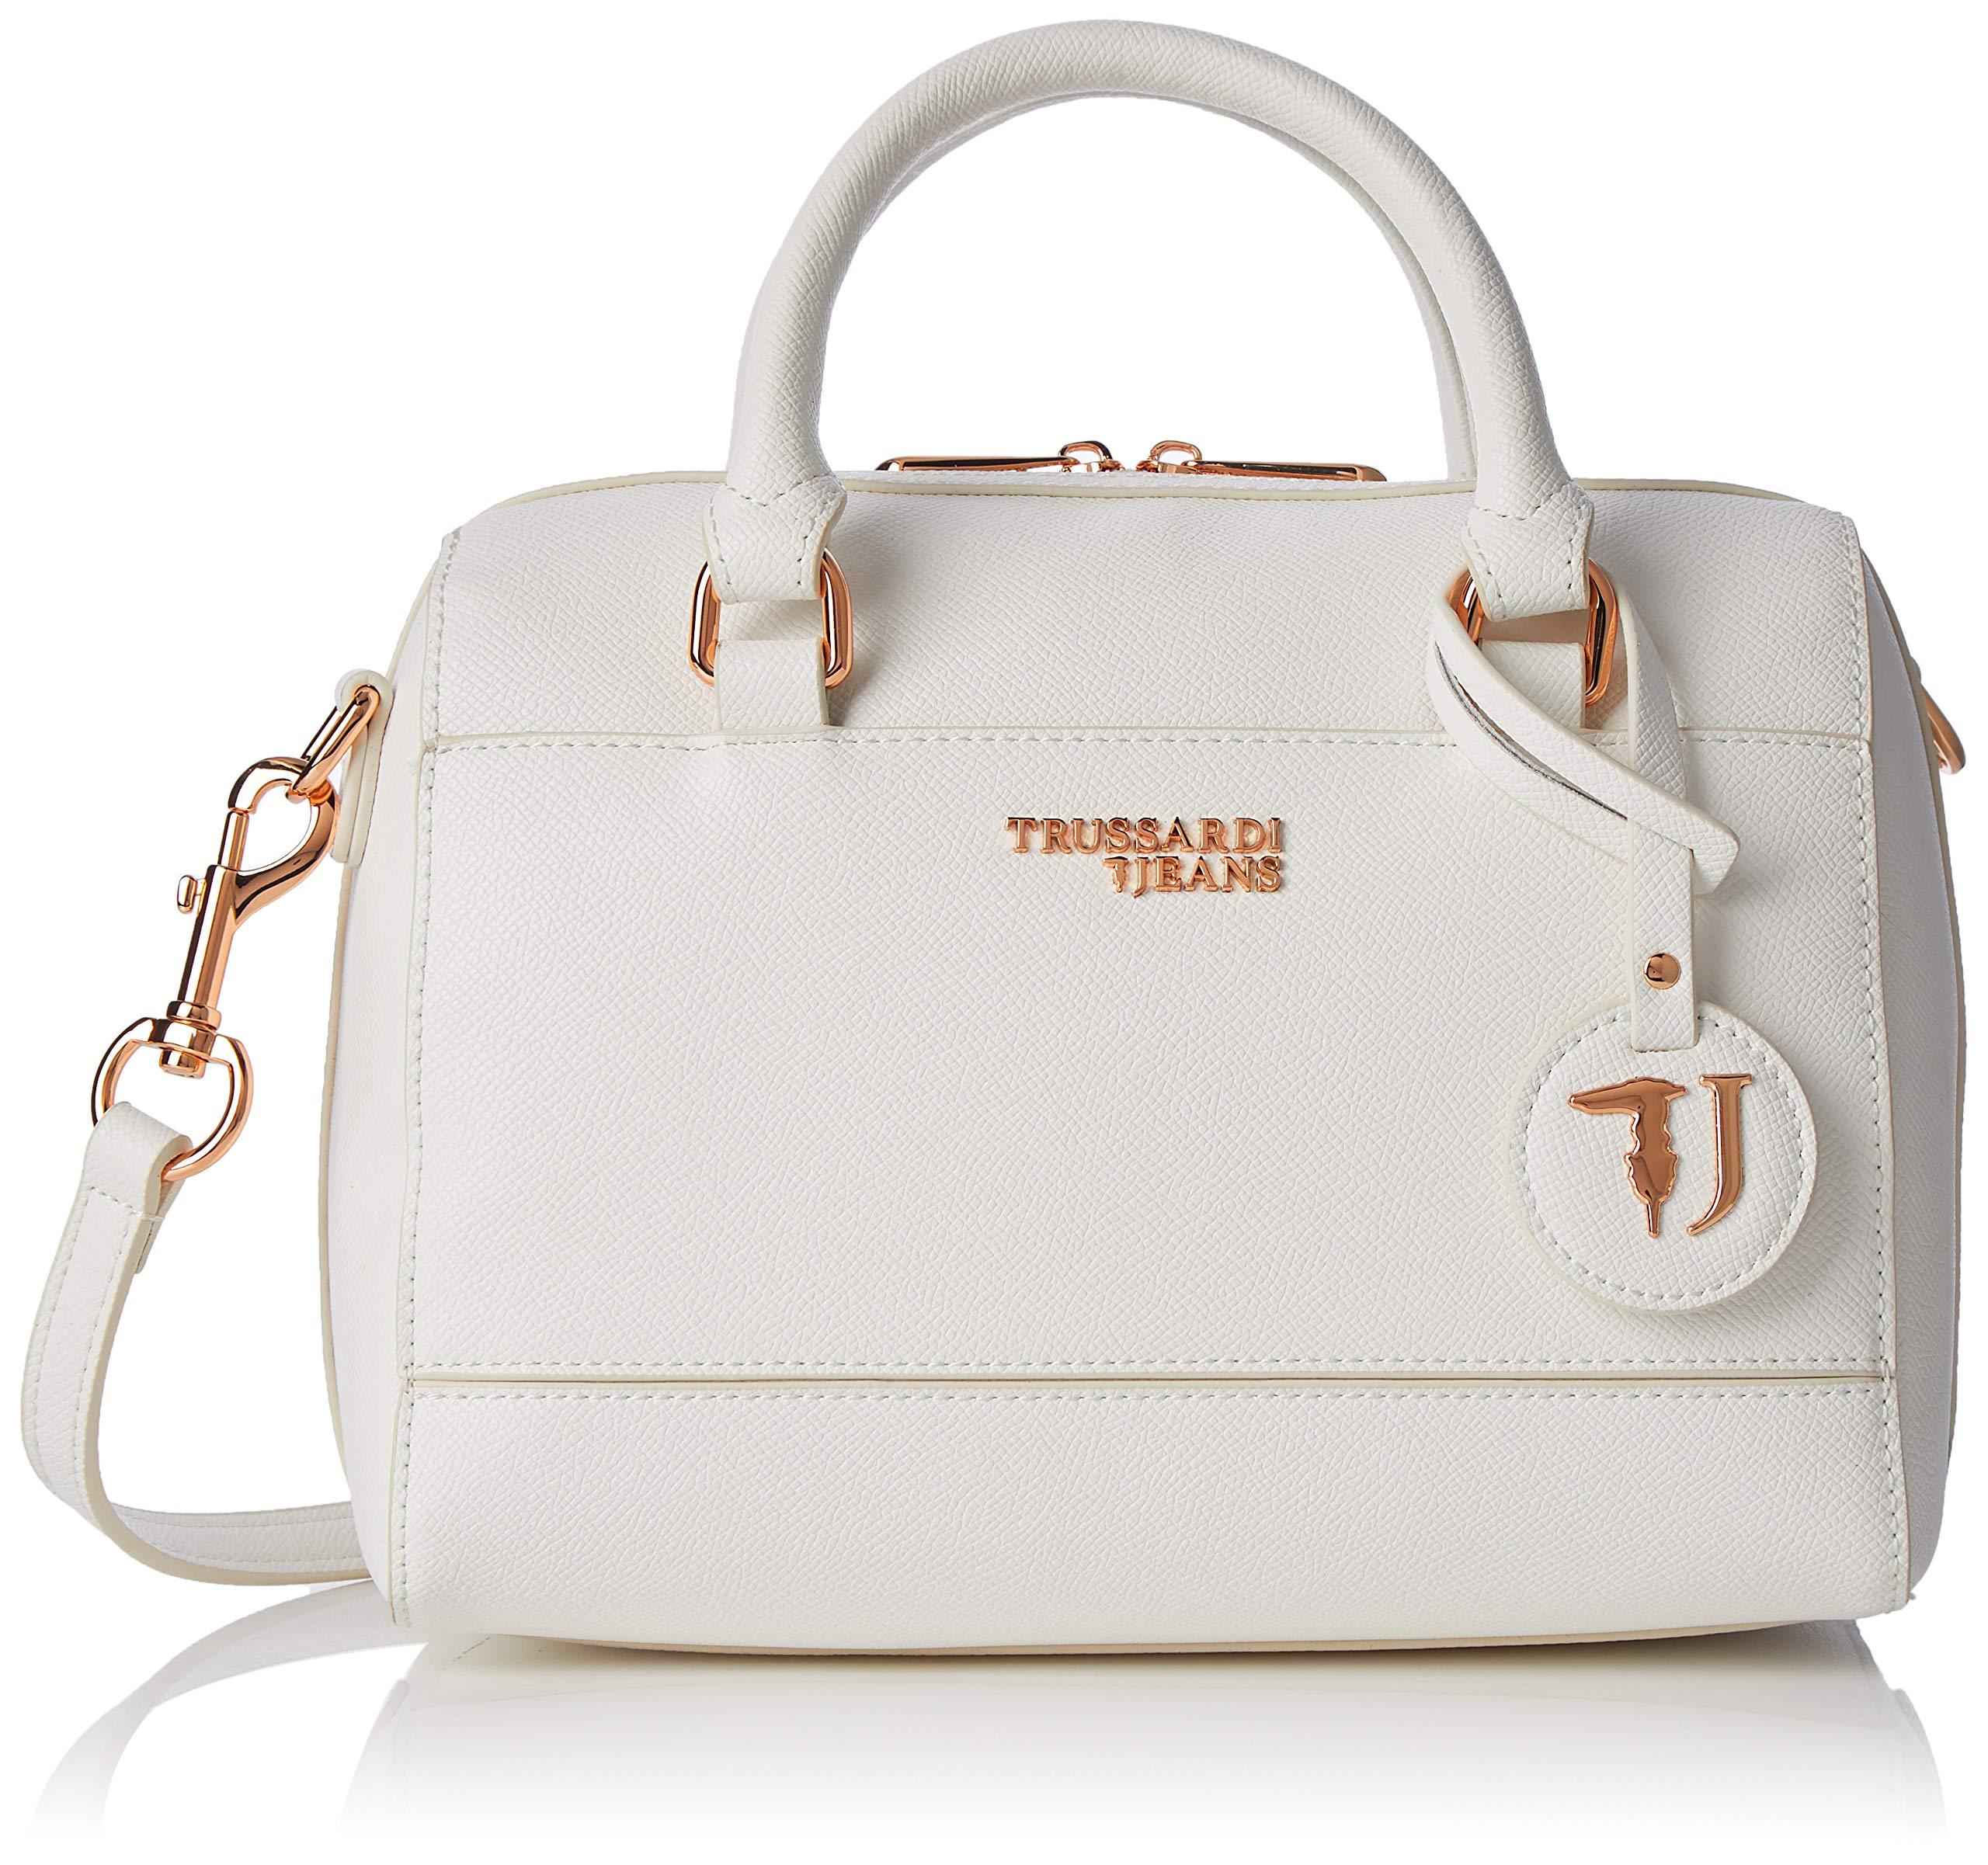 white25x19x15 H X Main T Porté Light BaulettoSac FemmeBlancoff Trussardi Cmw Jeans L easy 80wkOPXn